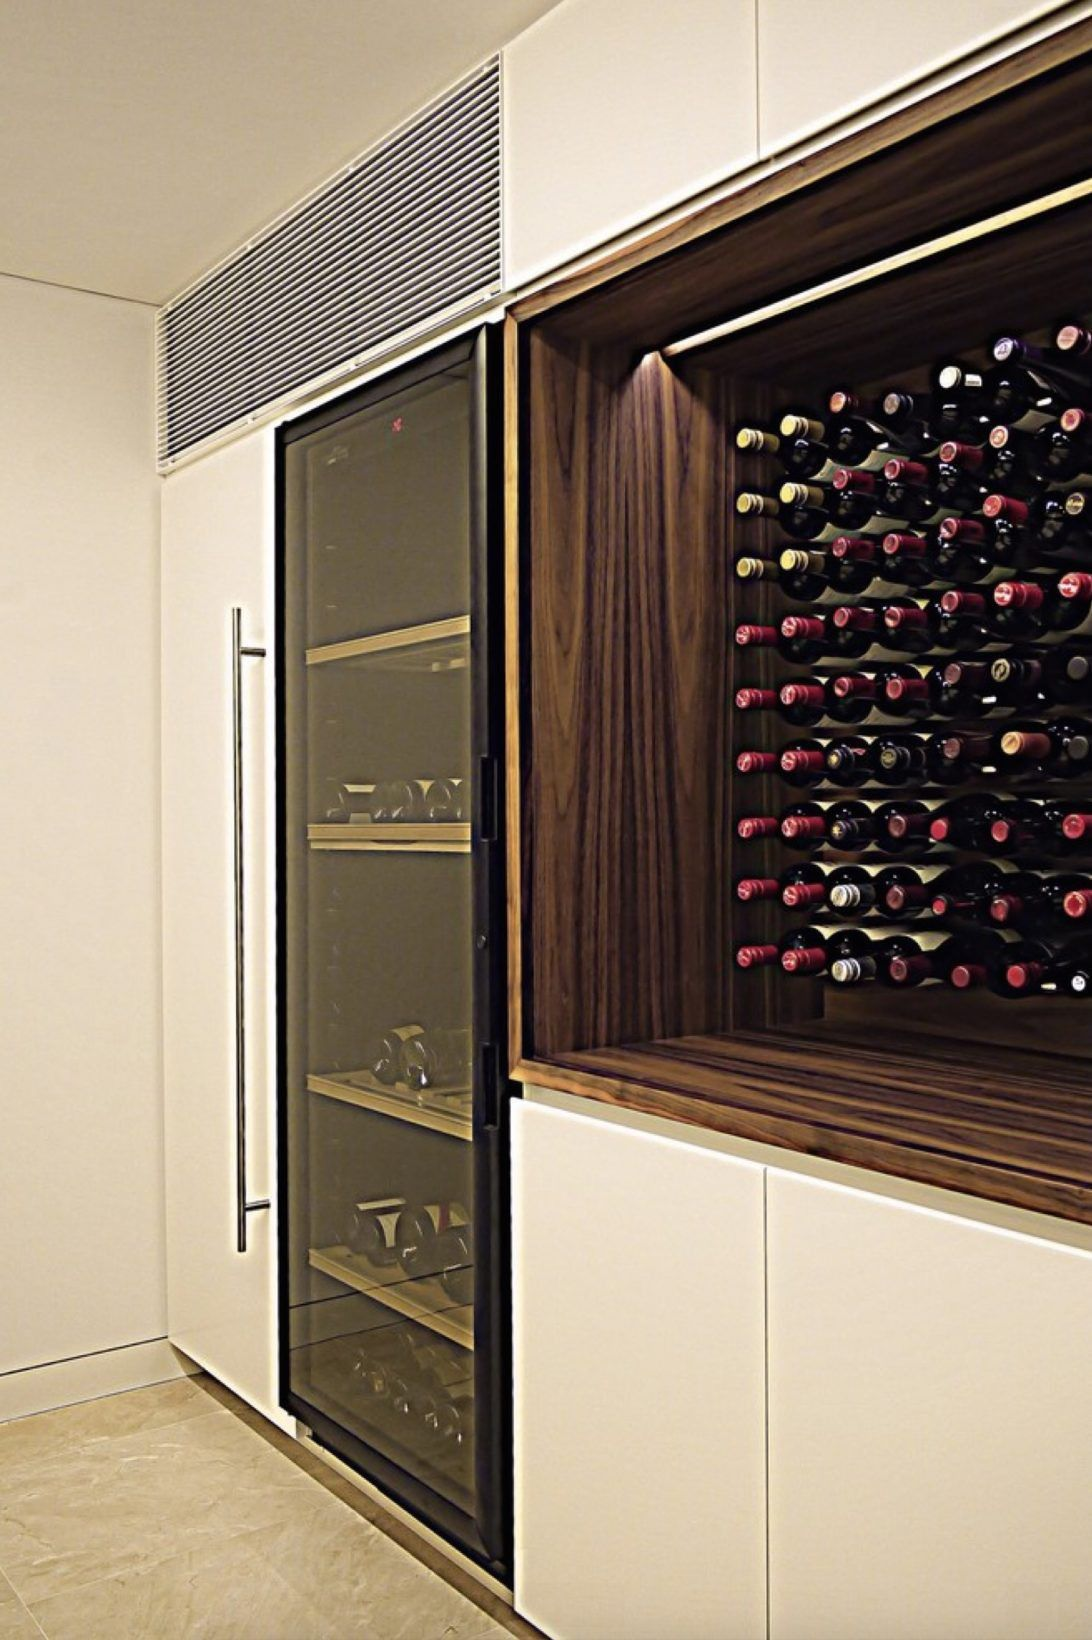 2019 Custom Built Wine Cabinets Corner Kitchen Cupboard Ideas Check More At Http Www Planetgreenspot Com Built In Wine Rack Wine Storage Glass Wine Cellar